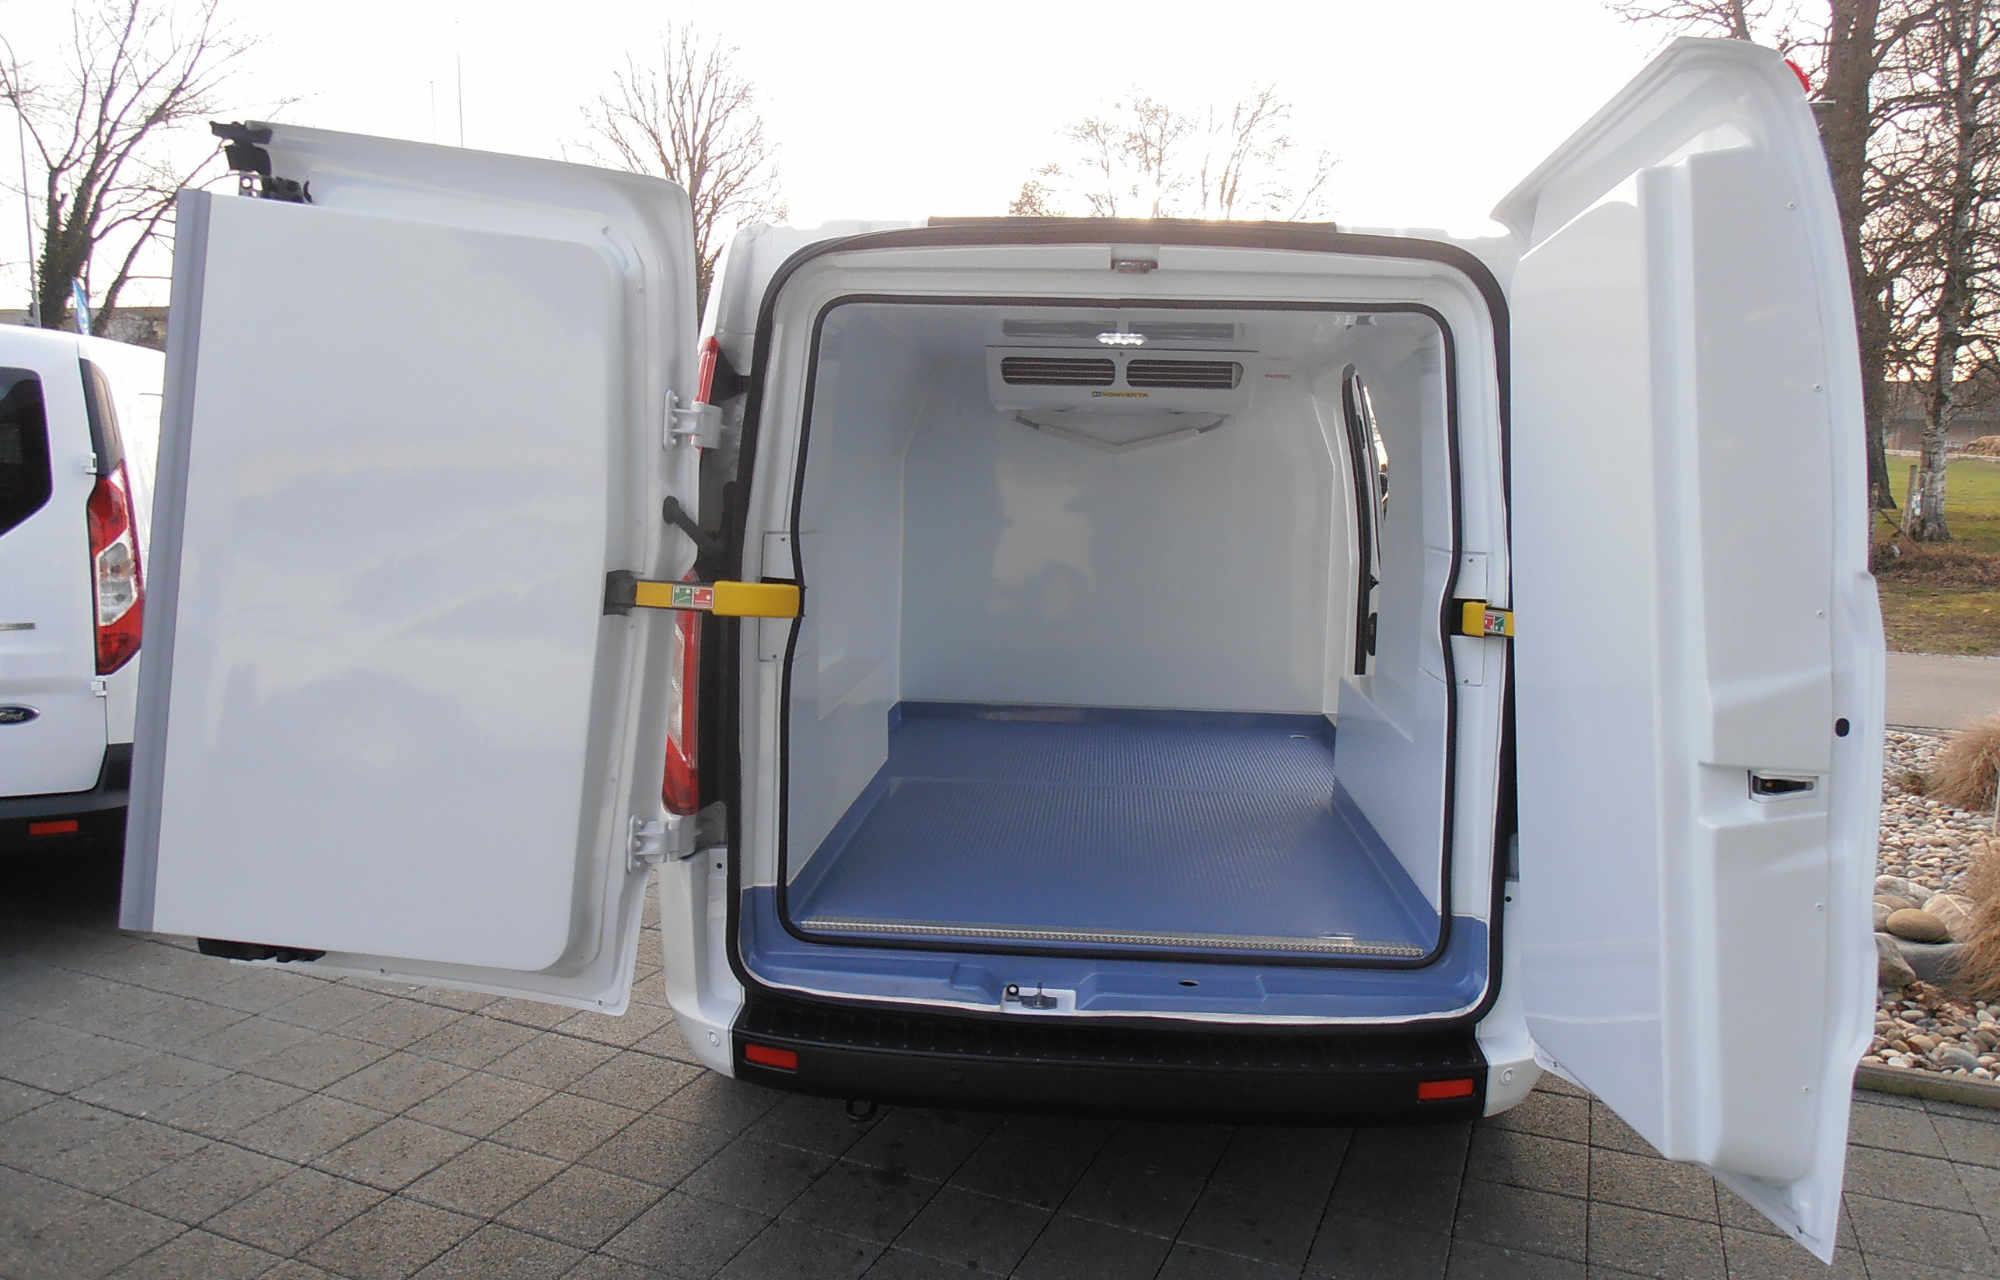 Umbau Ford Nutzfahrzeug Auto Center Worben